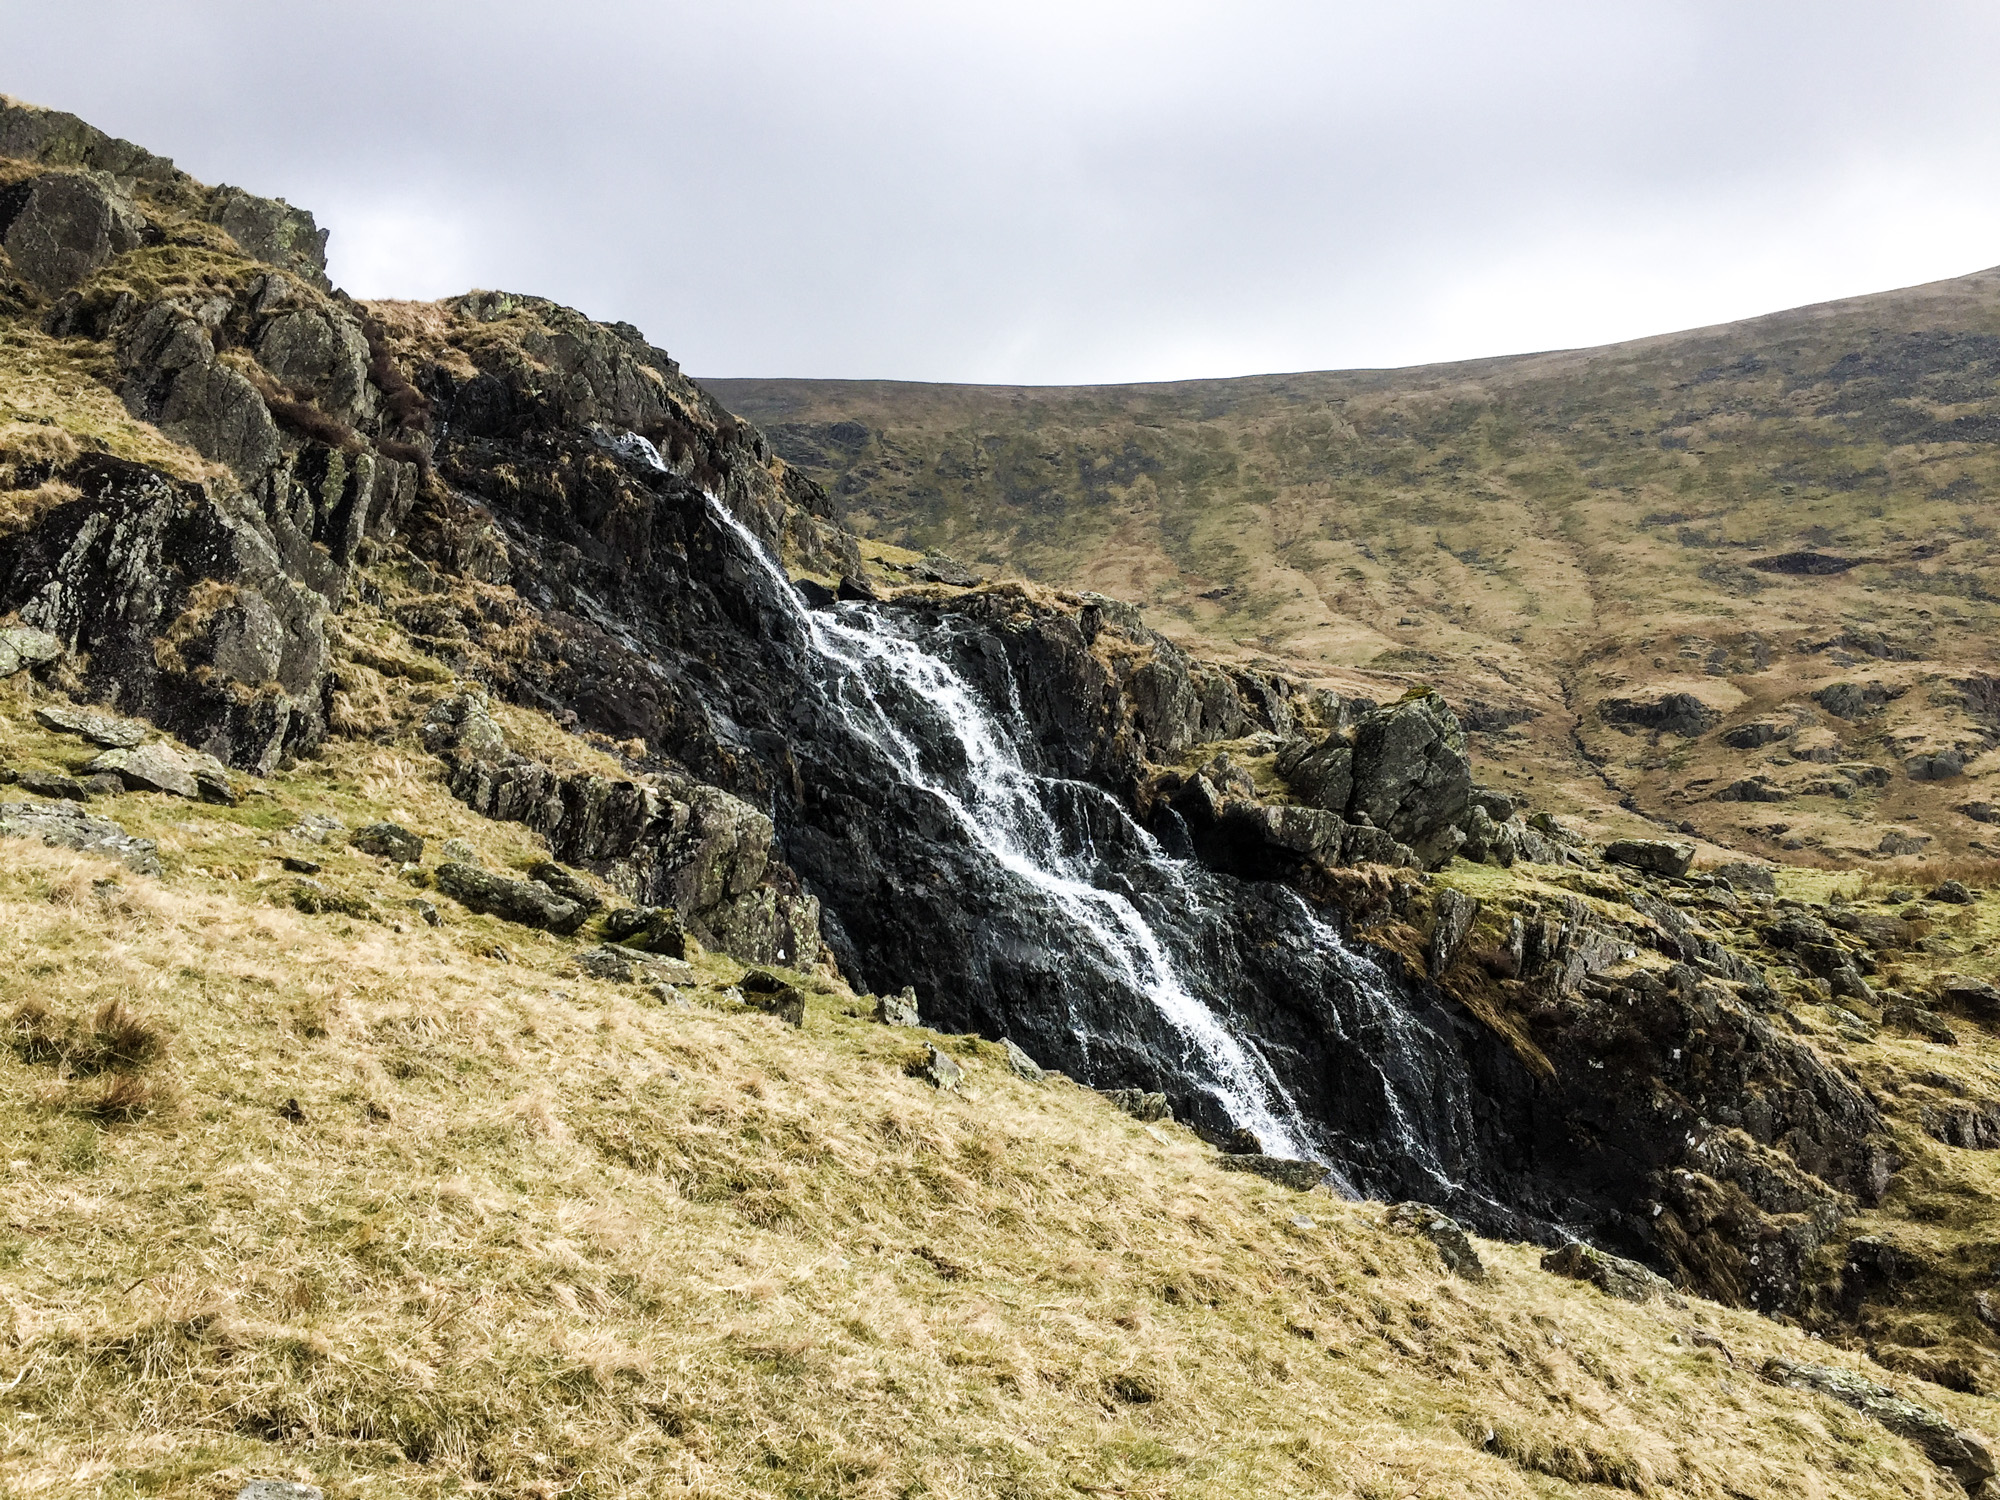 Waterfall on the way down